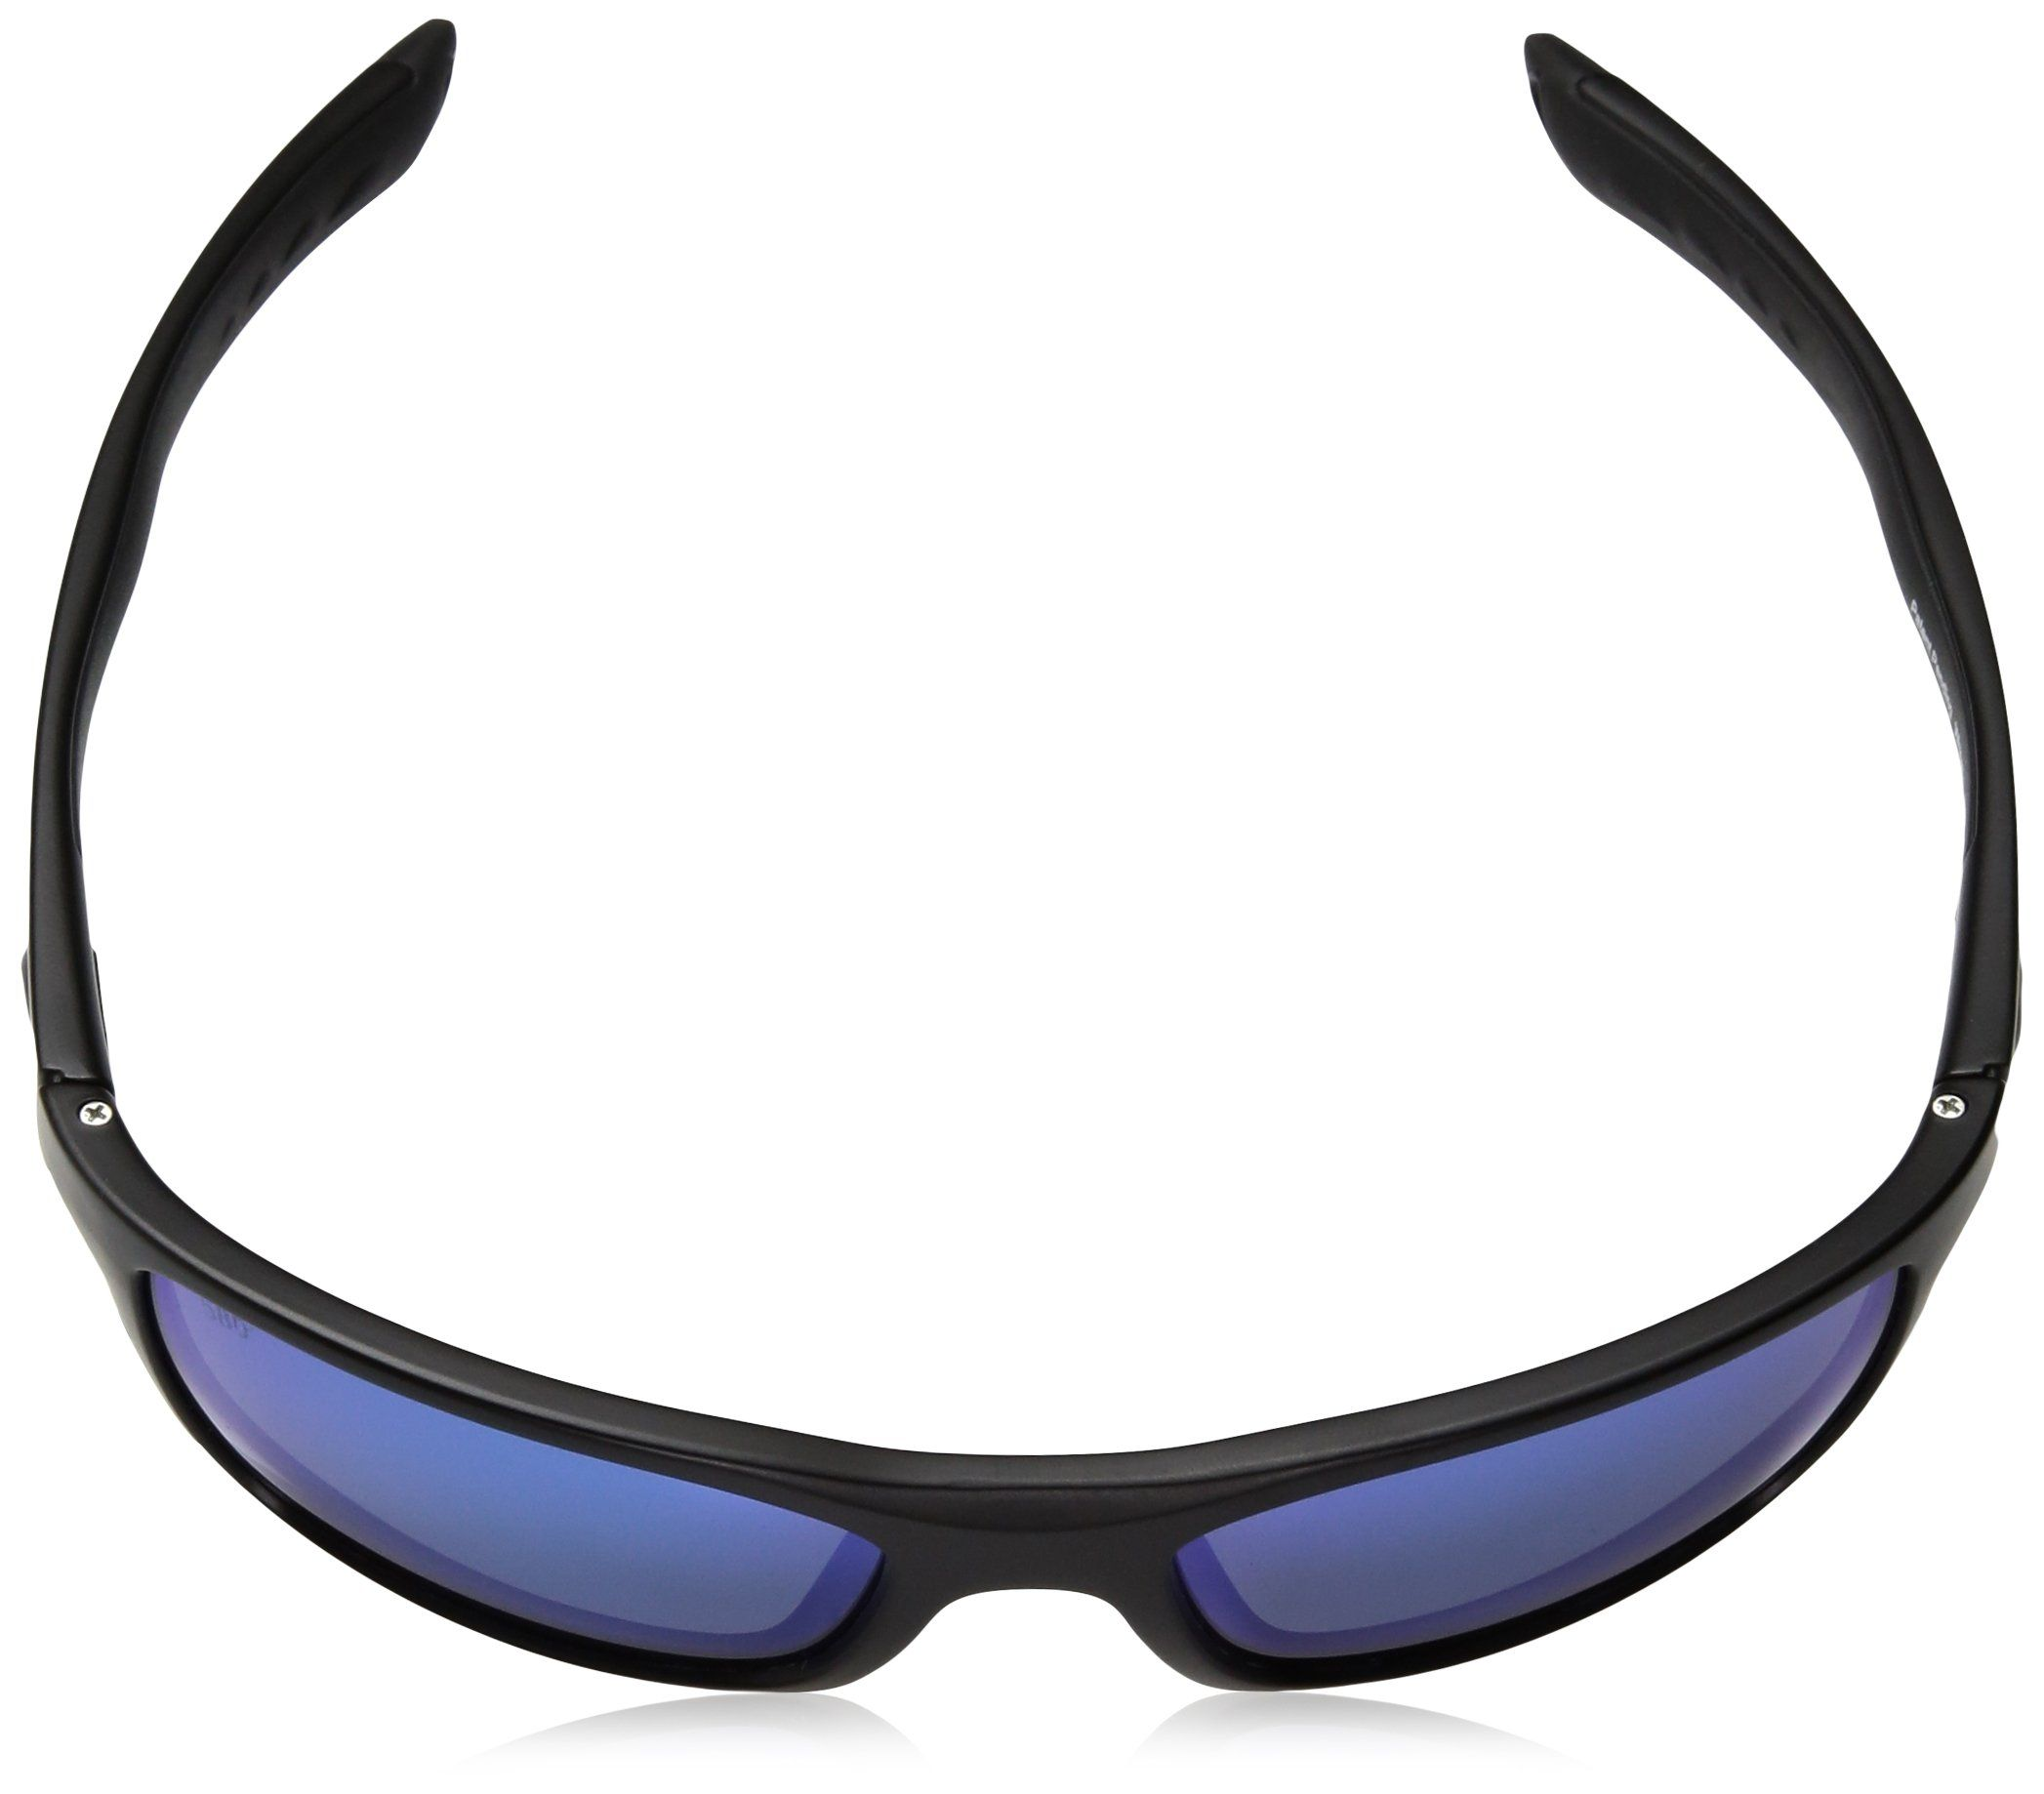 dce8fa4911 Costa del Mar Mens Whitetip Polarized Iridium Rectangular Sunglasses  Blackout 58 mm -- Be sure